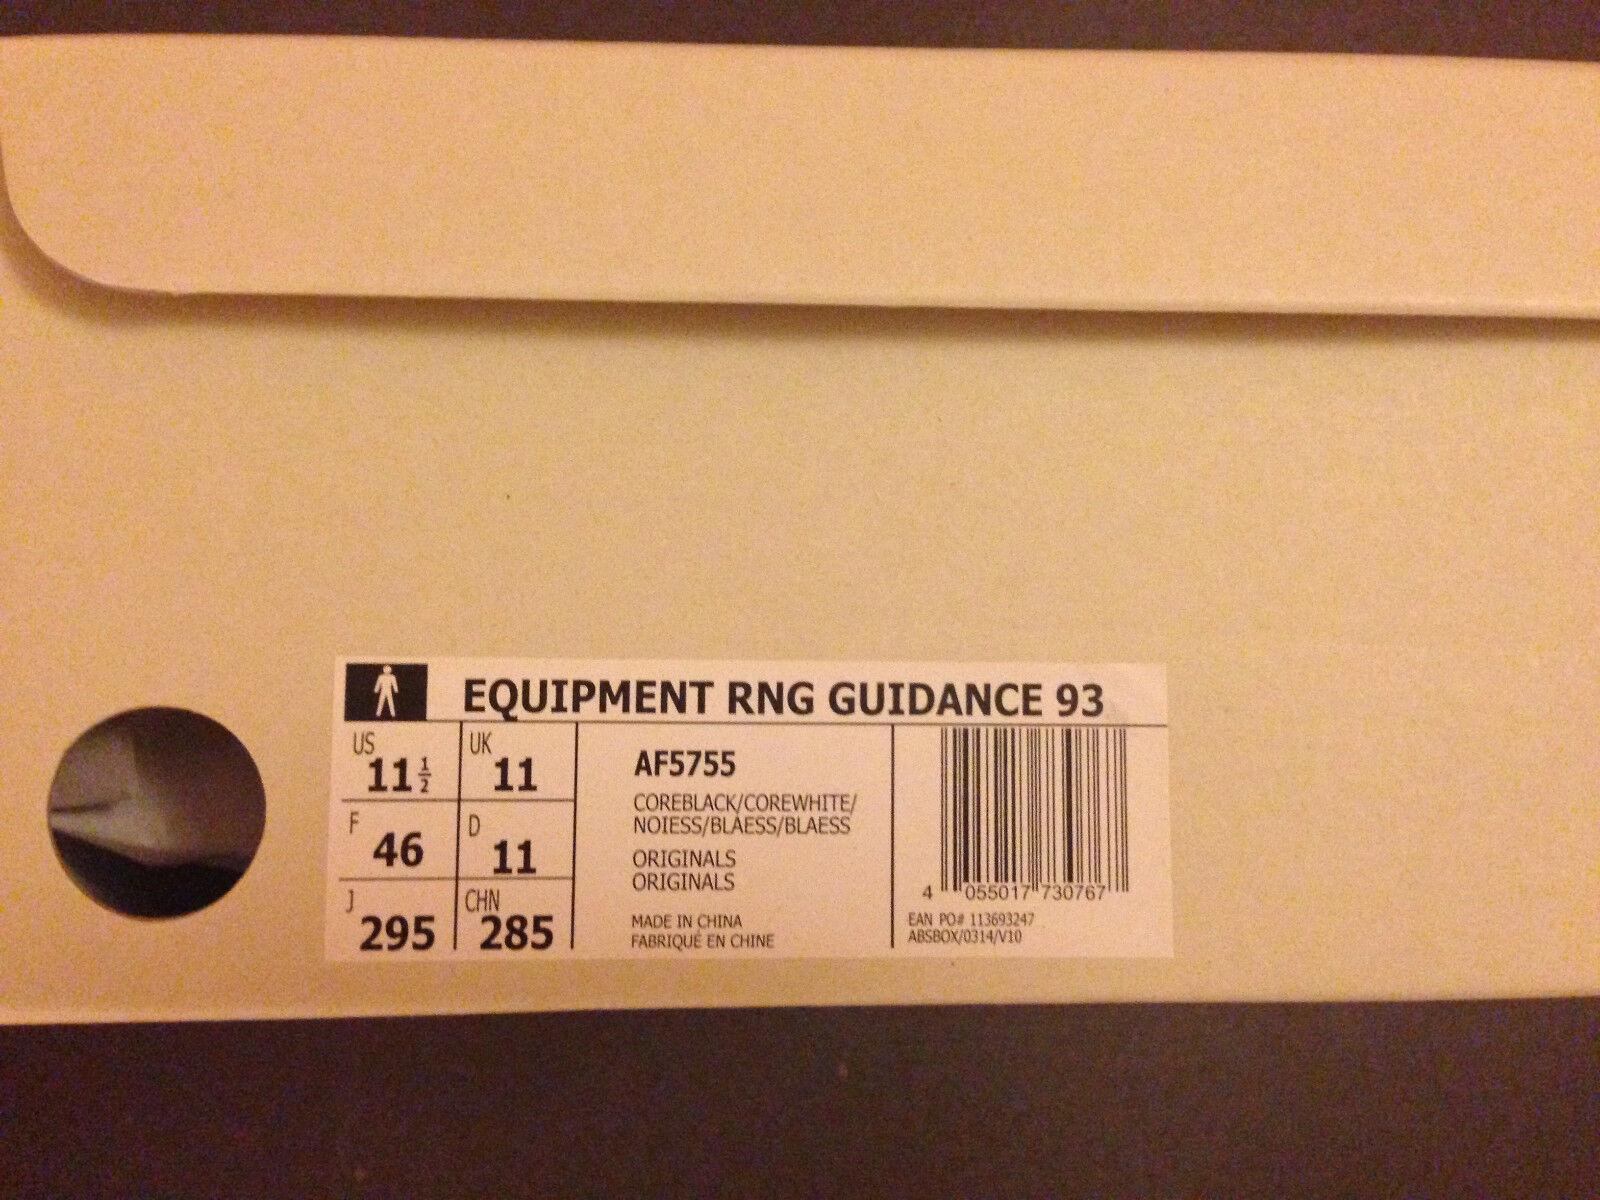 Adidas Equipment RNG Guidance 93 x box SNS EQT new in box x   11,5 UK 11 FR 46  31734a